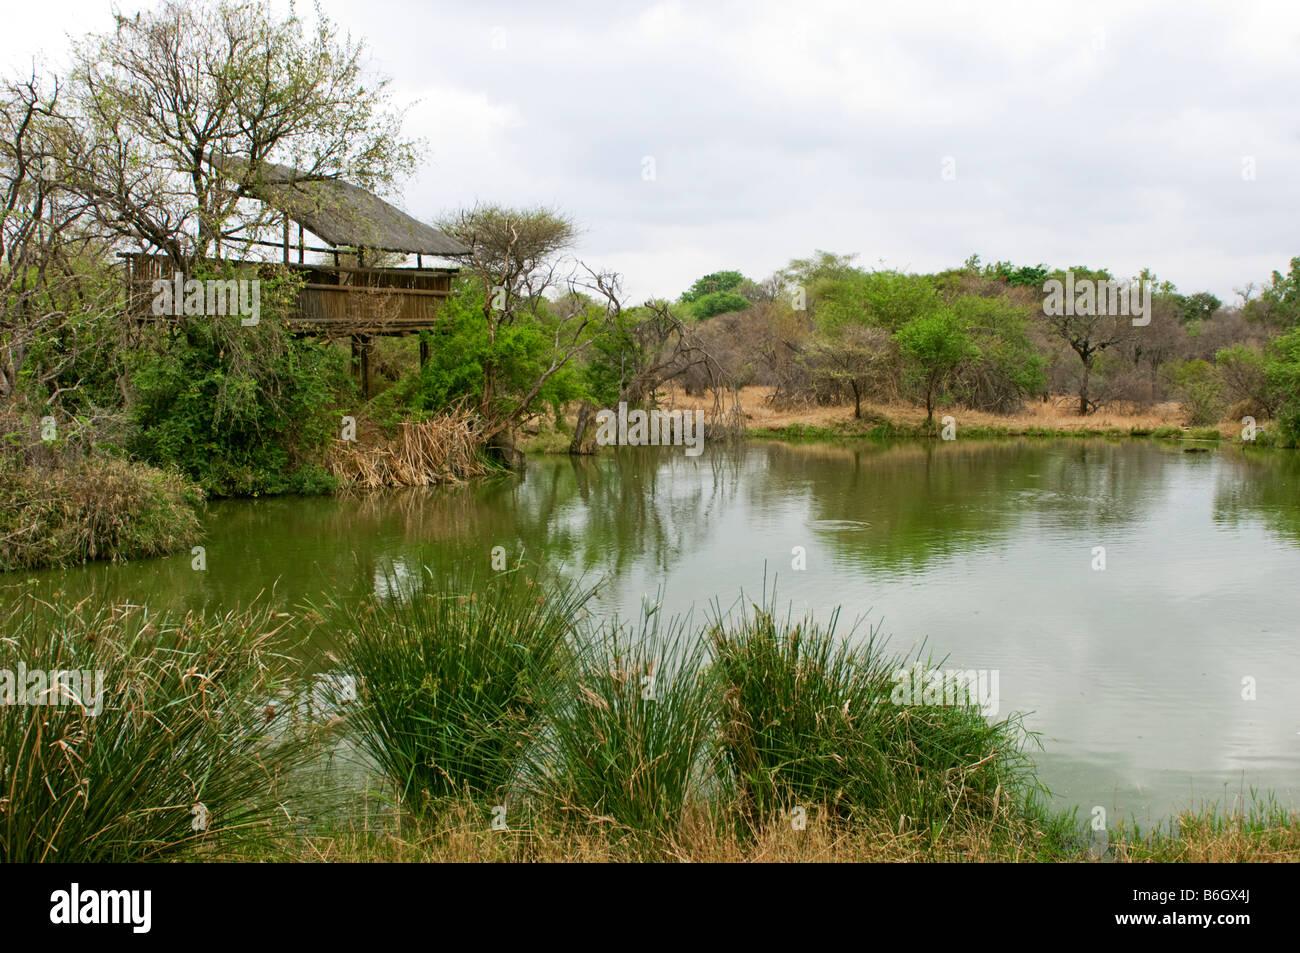 HIPPO HIDE water hole bushland bush wildlife wild green water edge waterhole south-Afrika south africa landscape - Stock Image